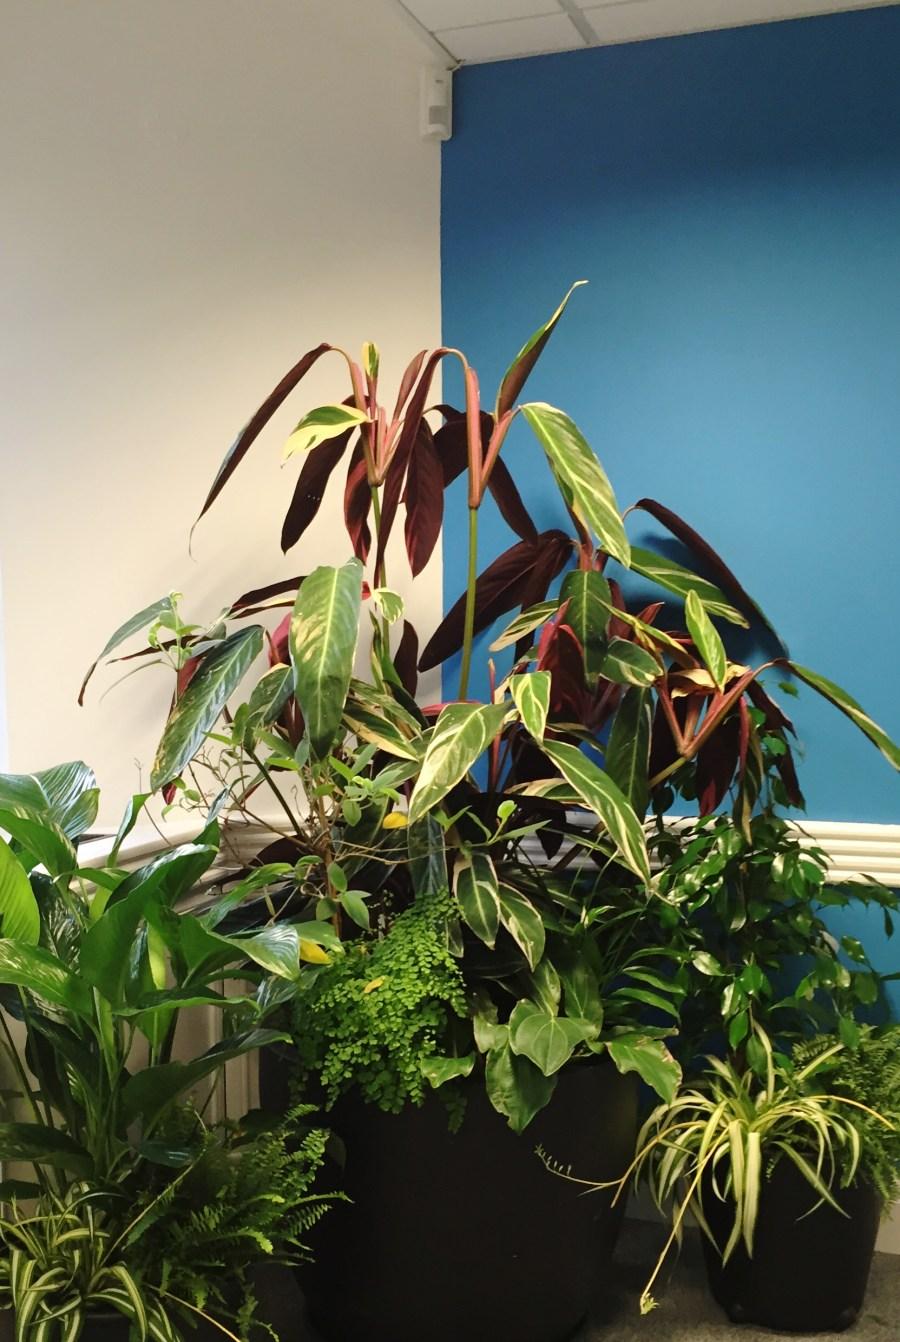 reduce-pollution-indoor-plant-office-houseplants-bespoke-design-curious-gardener-1